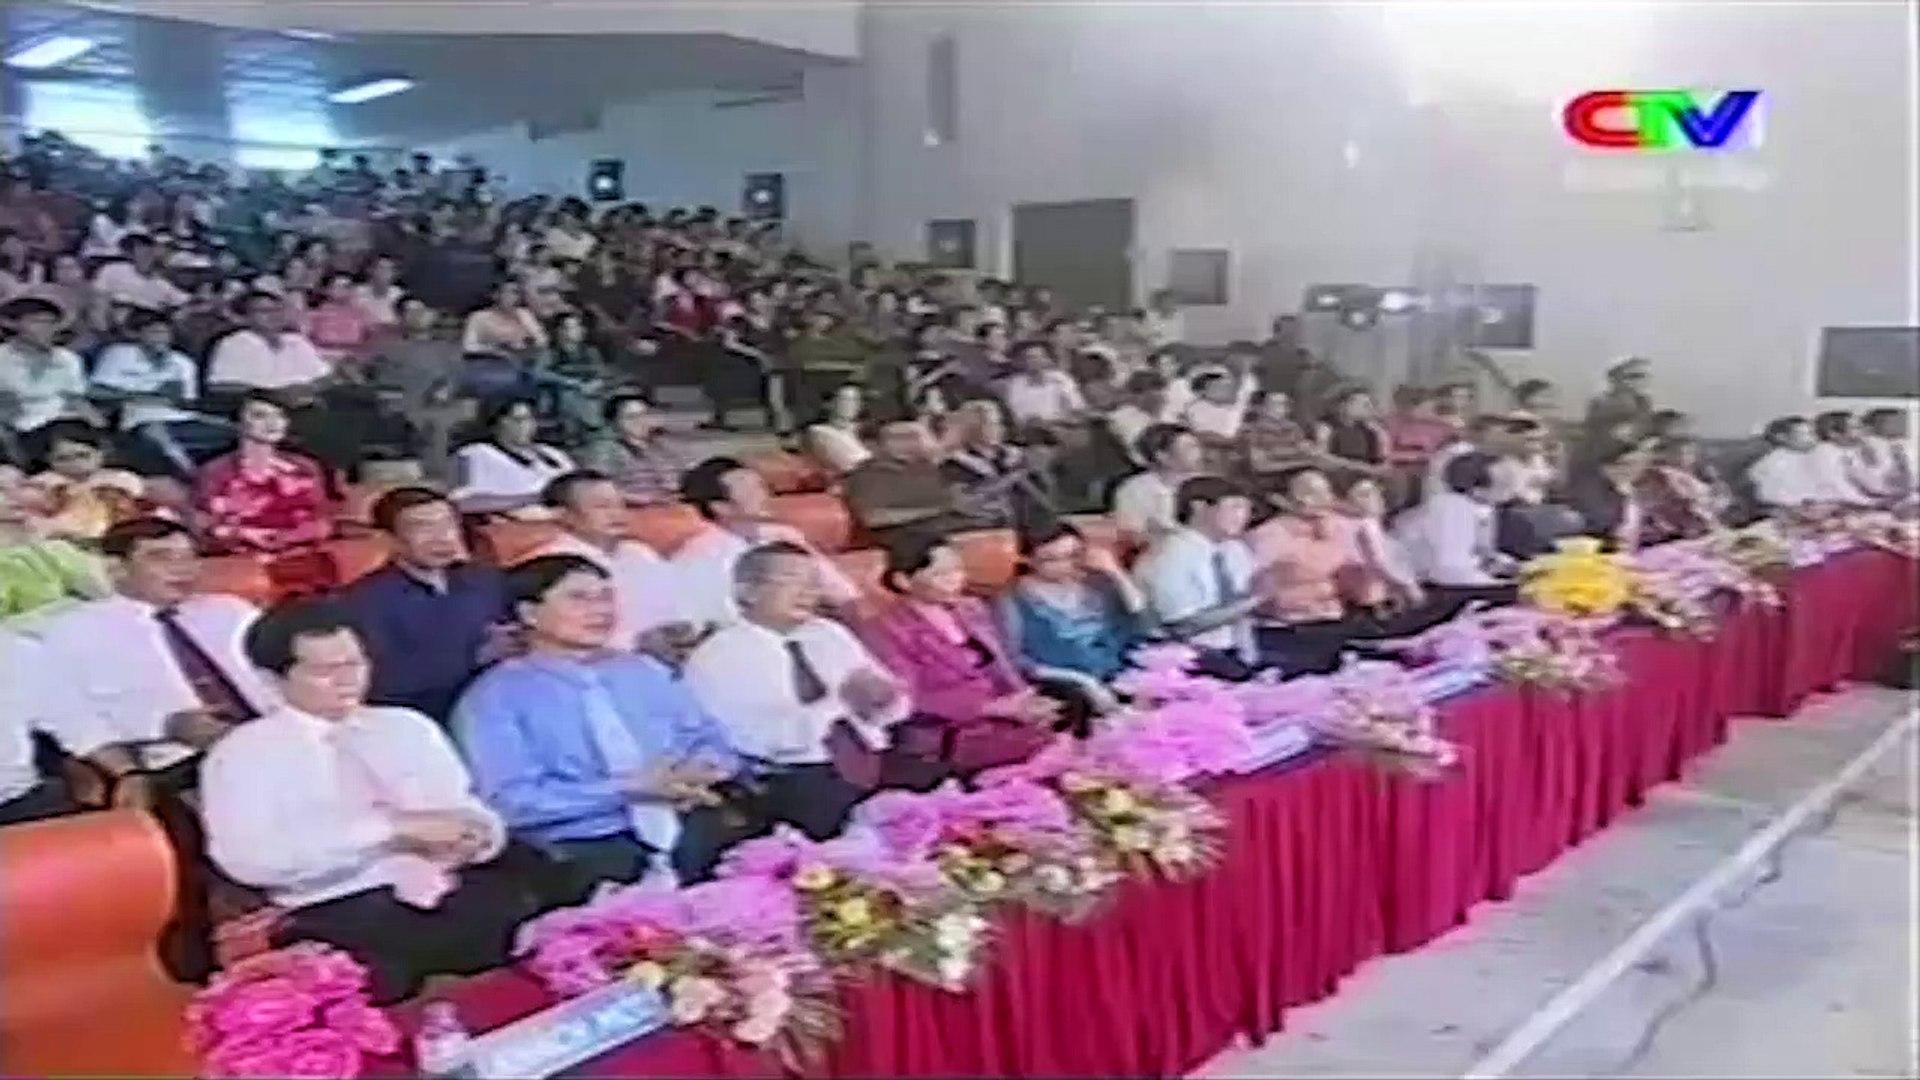 [Karaoke] Bụi Phấn - Lương Bích Hữu [Beat]